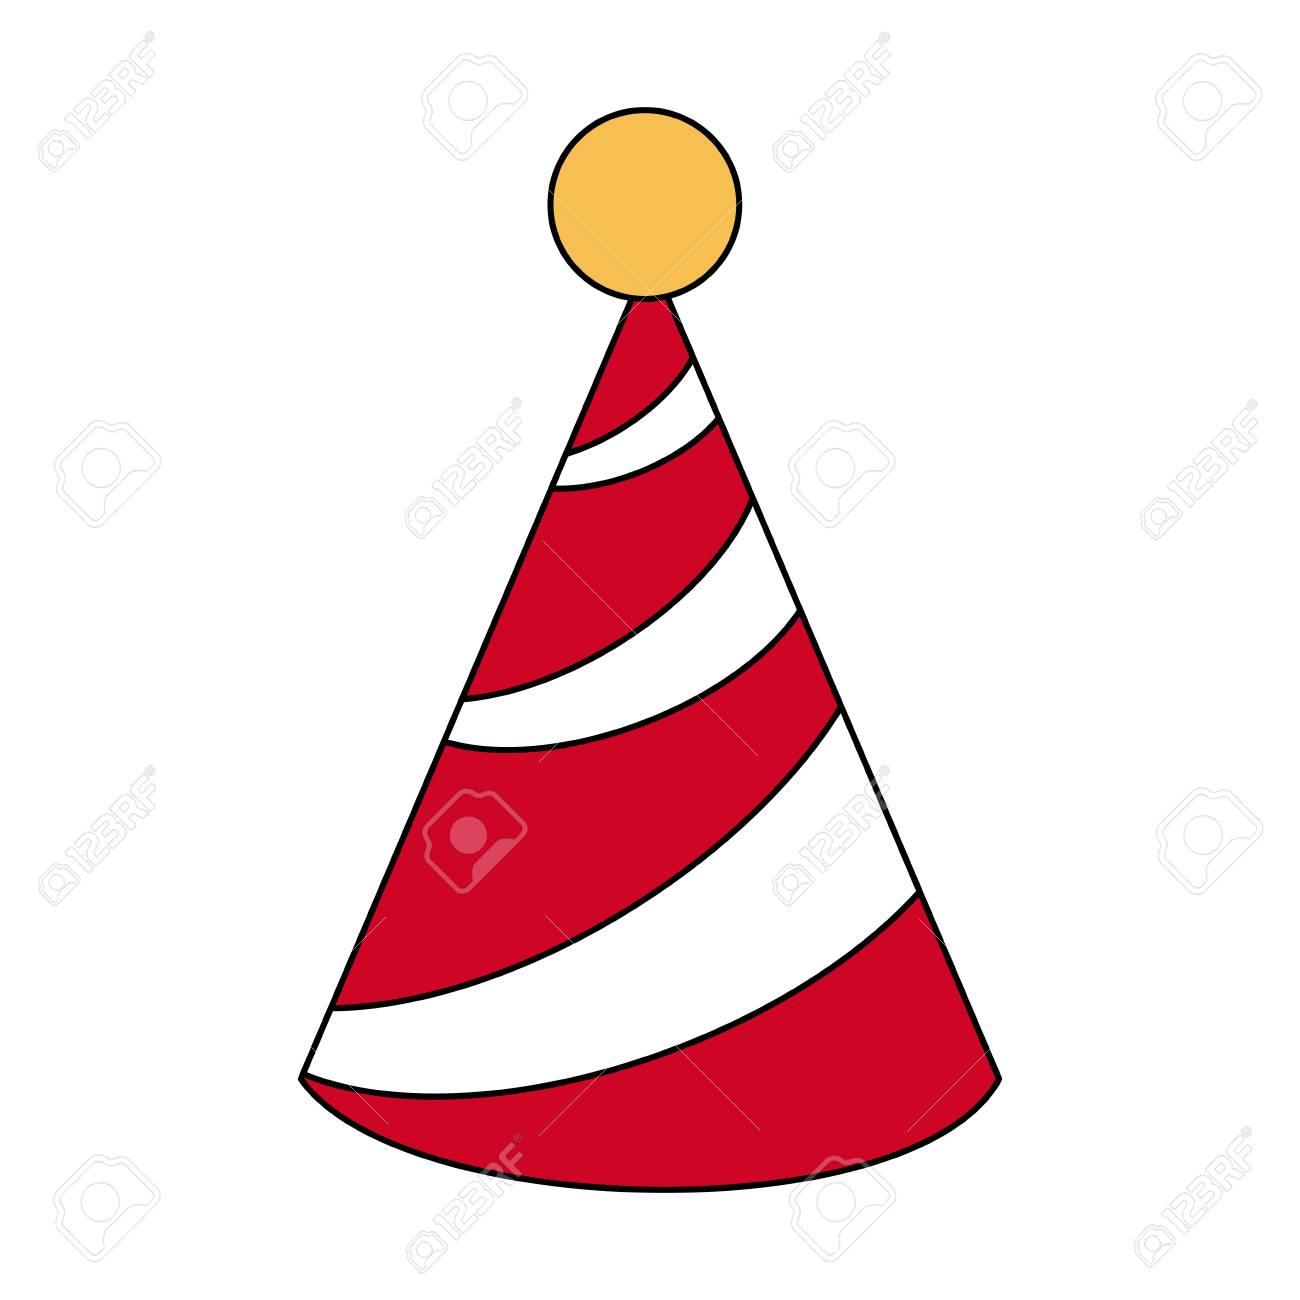 Birthday Hat Symbol Icon Vector Illustration Graphic Design Royalty